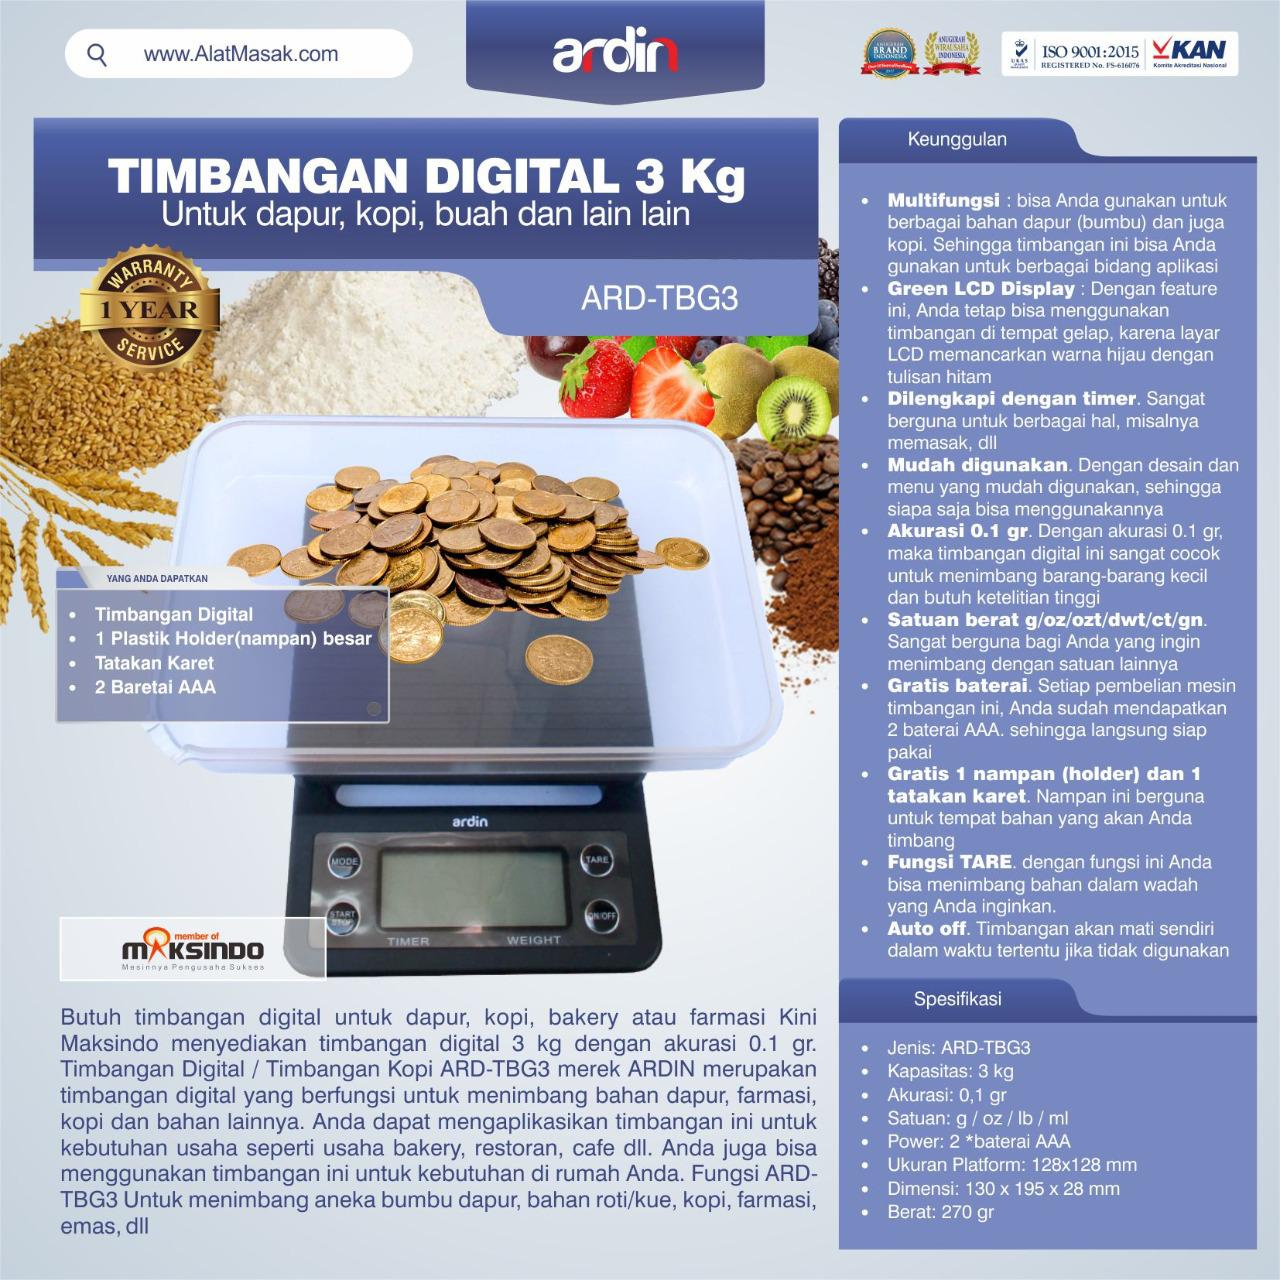 Jual Timbangan Digital 3 kg / Timbangan Kopi ARD-TBG3 di Semarang